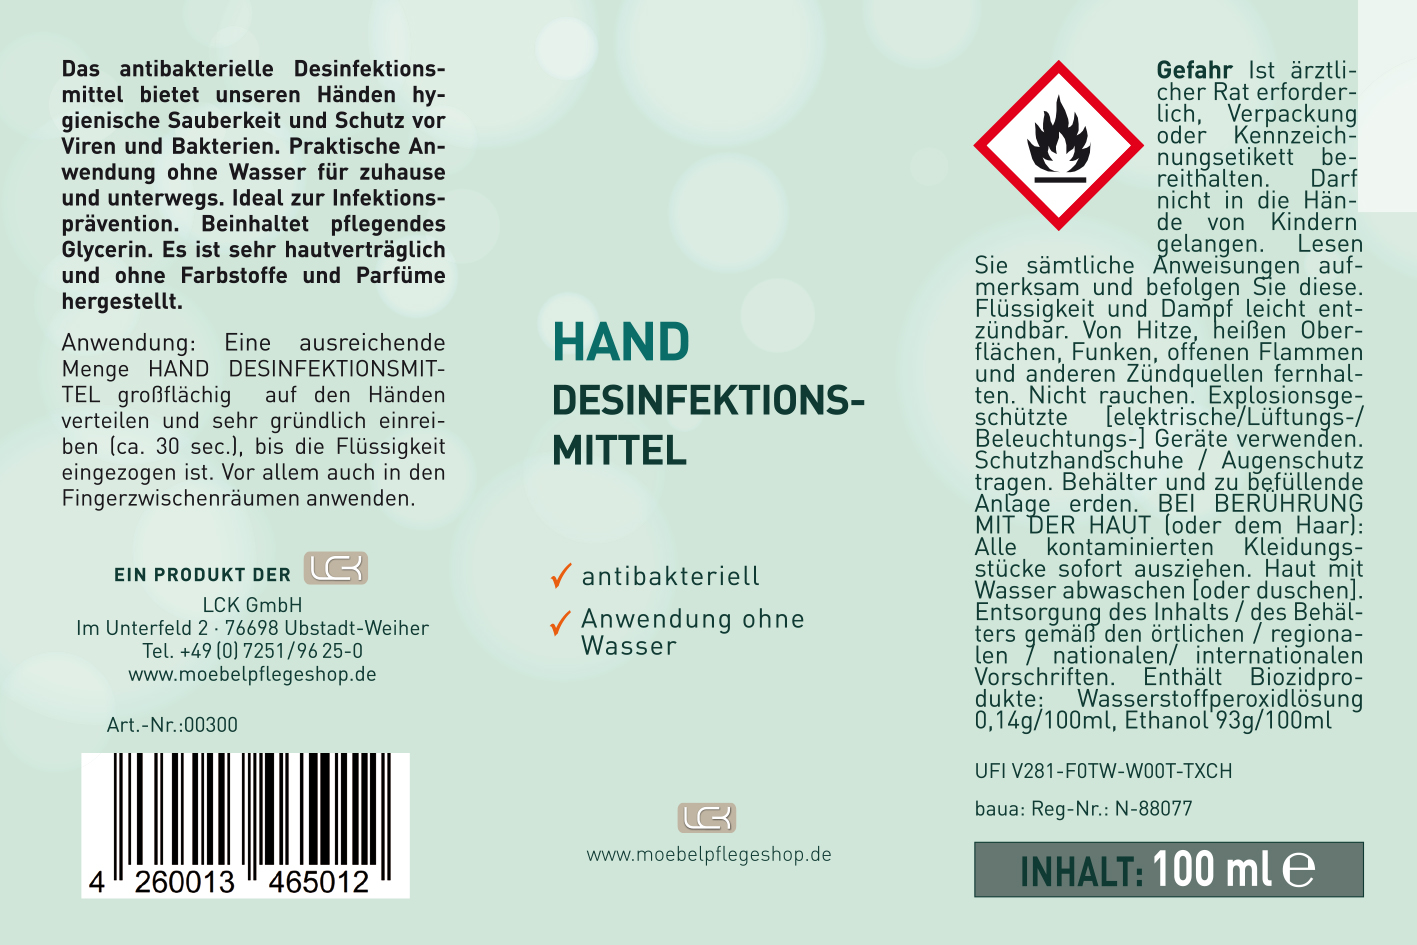 Hand-Desinfektion + Hygiene-Reiniger + 3 Atemschutz-Masken + Handschuhe 2